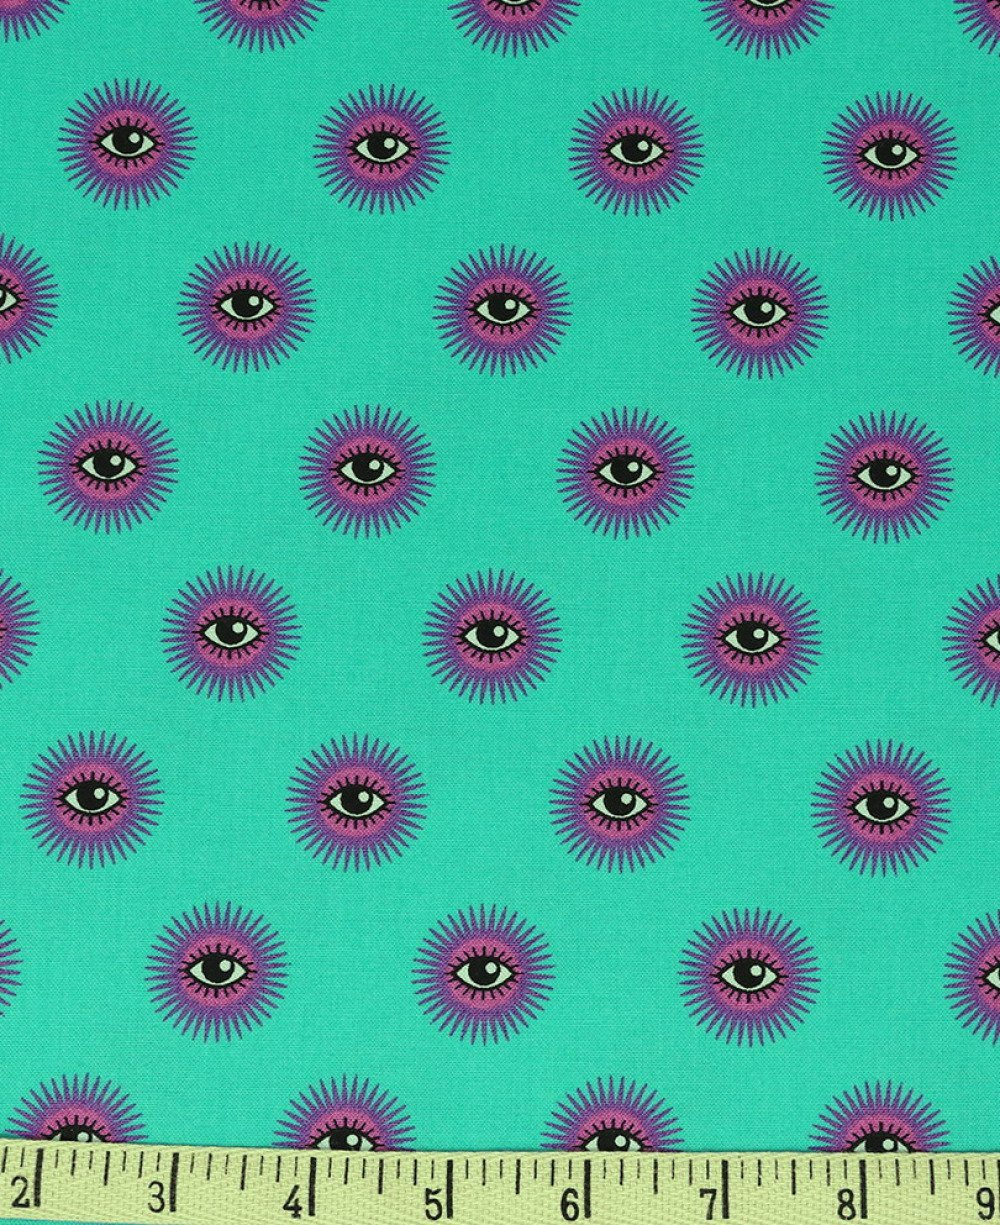 Tissu patchwork turquoise, Tula Pink, Free Spirit, De le Luna